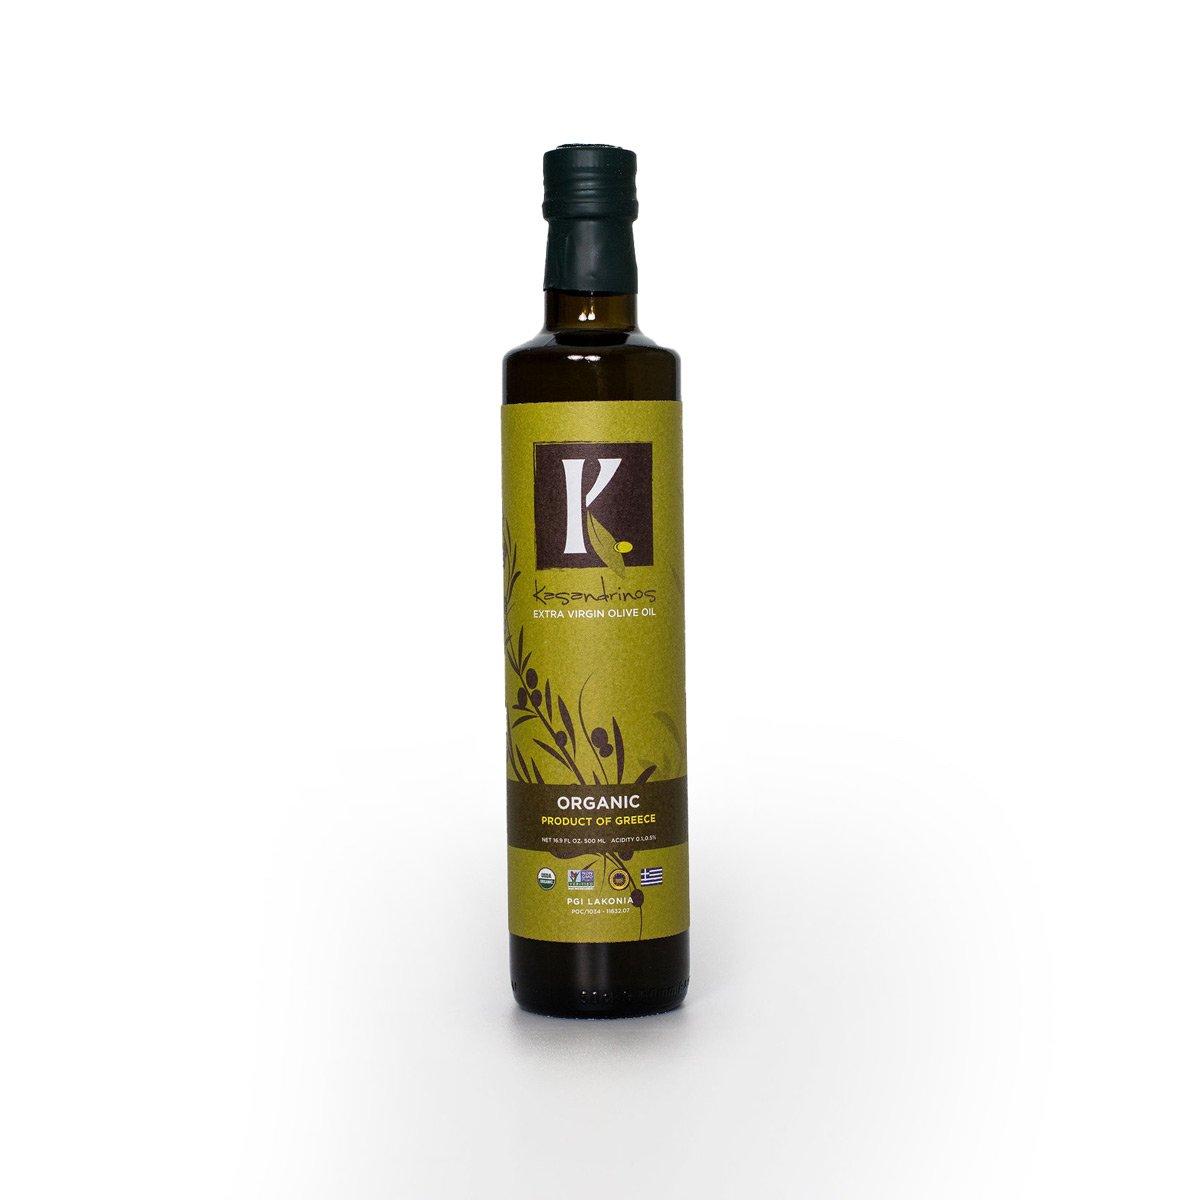 Kasandrinos Extra Virgin Olive Oil - Kasandrinos - Certified Paleo, Keto Certified by the Paleo Foundation